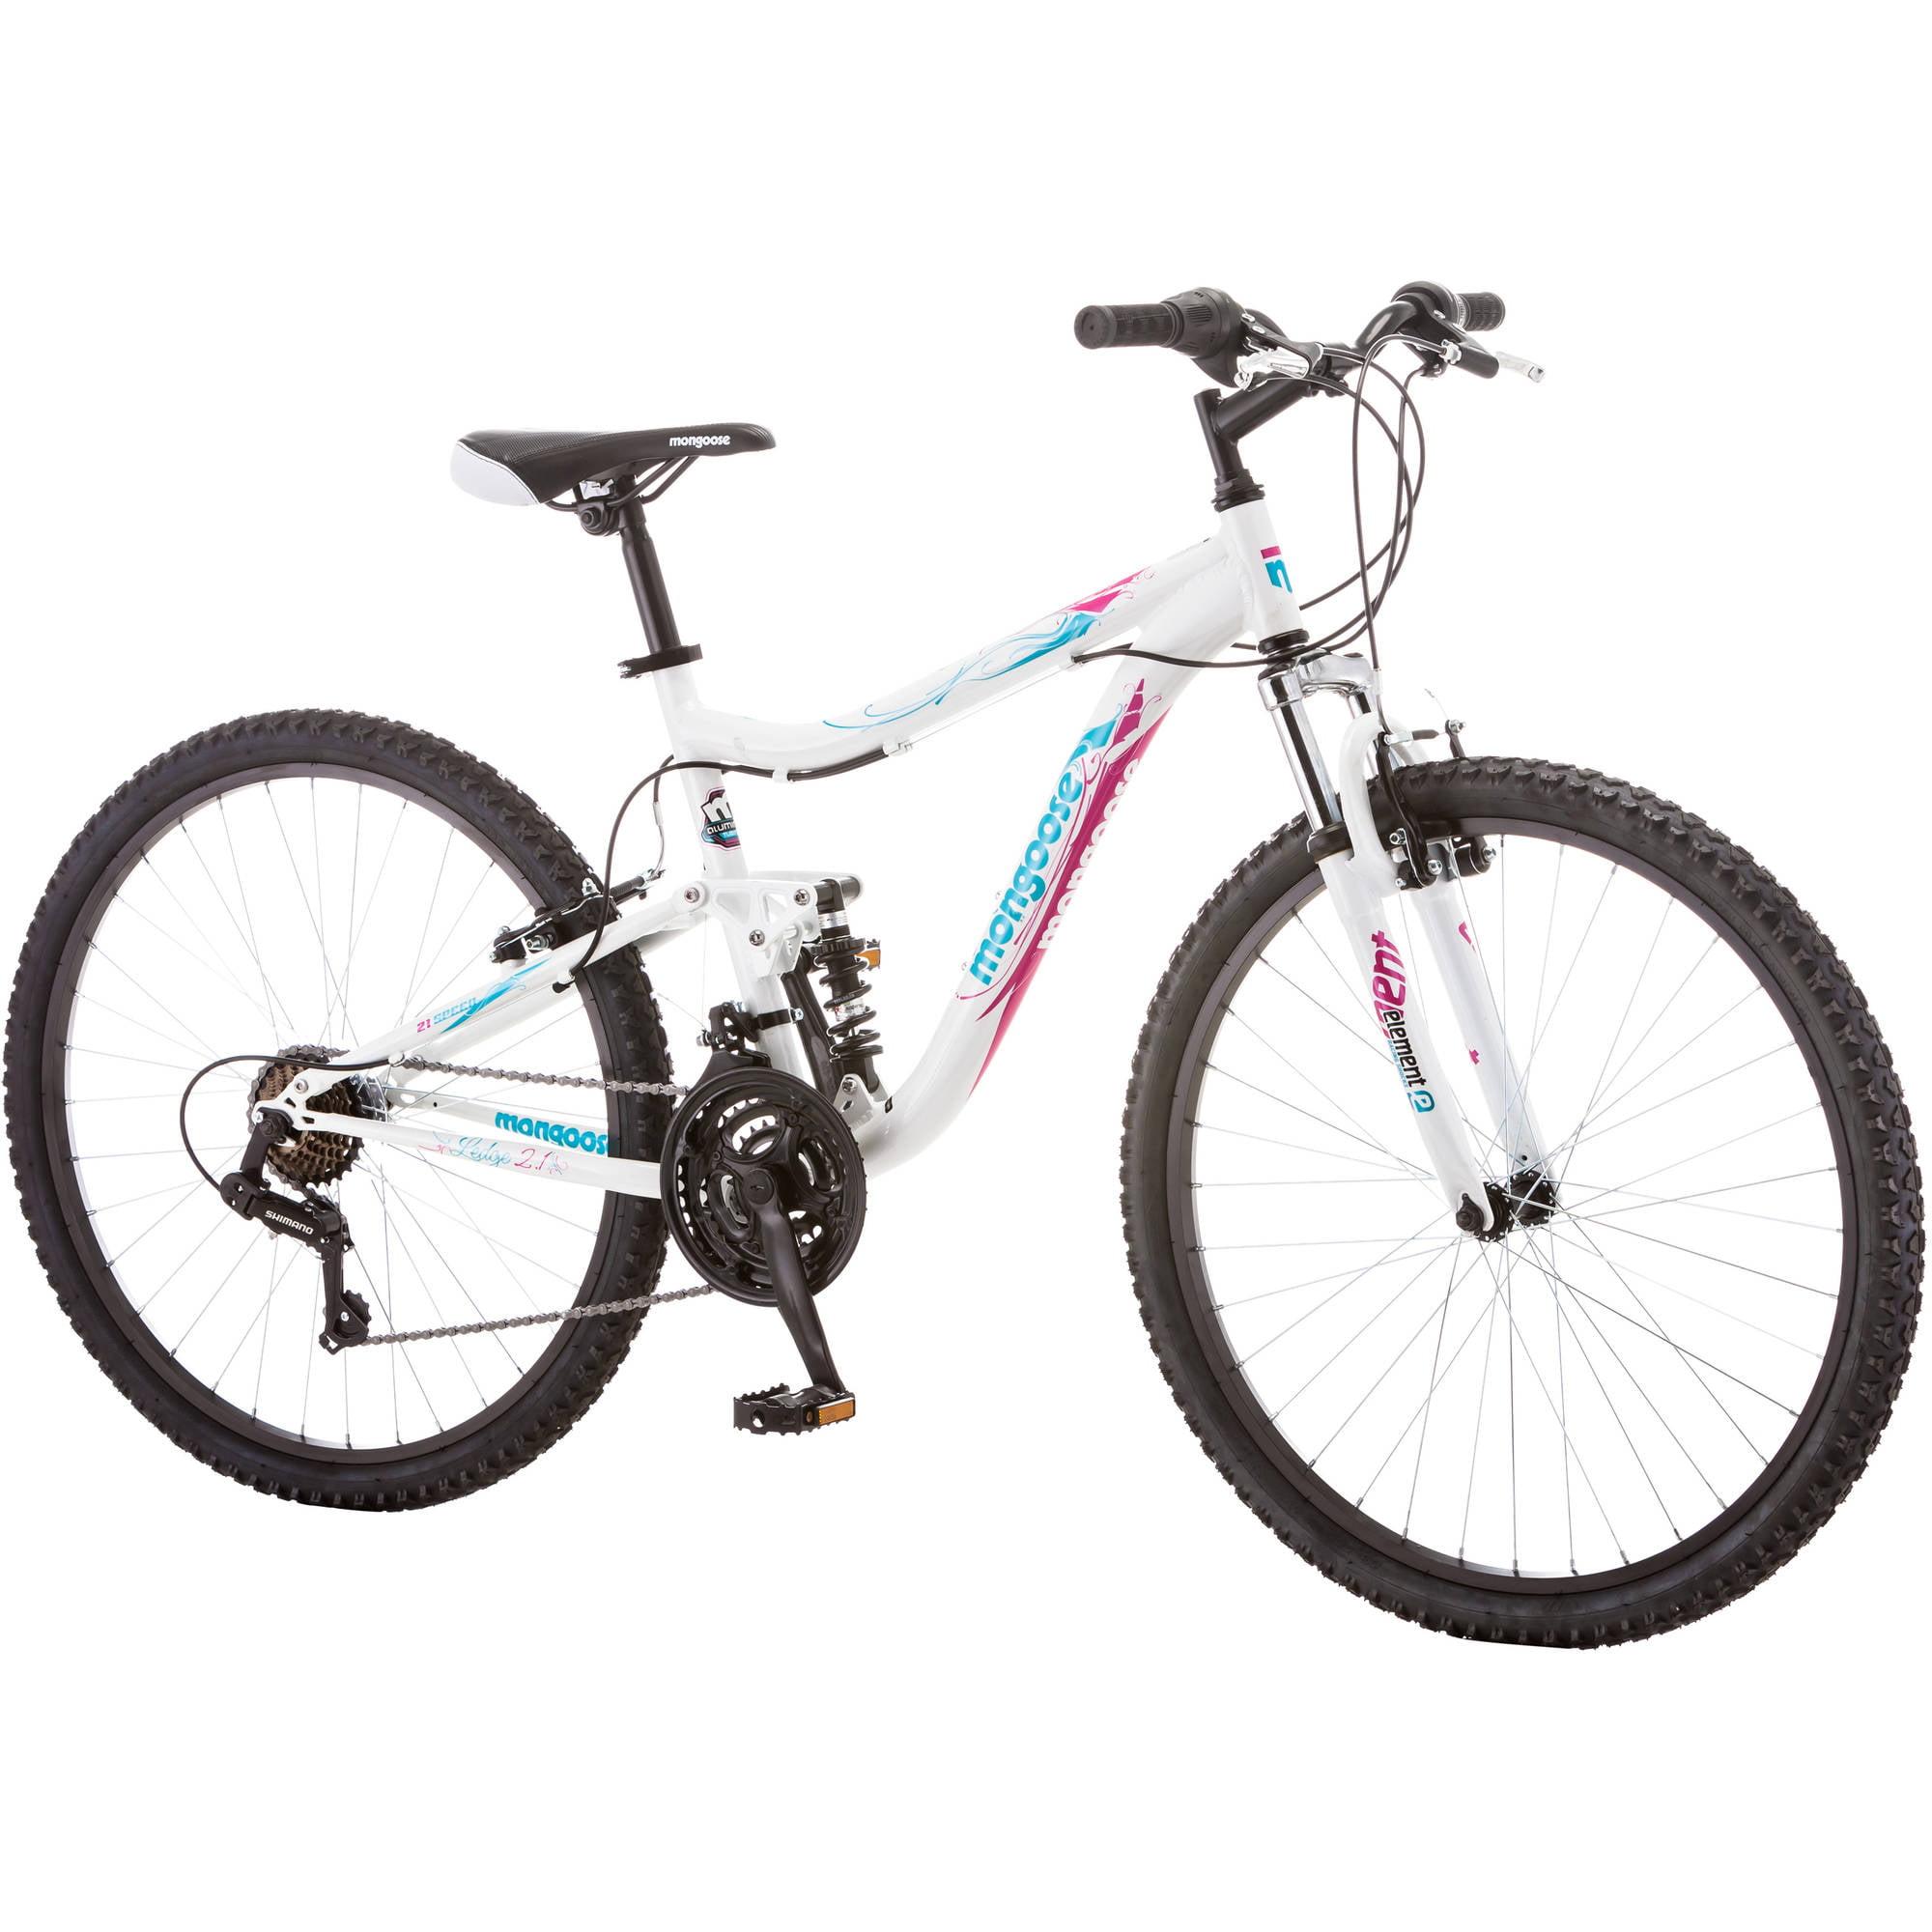 "Mountain Bike 26"" Women Dual Suspension Aluminum Frame Bicycle 21 ..."